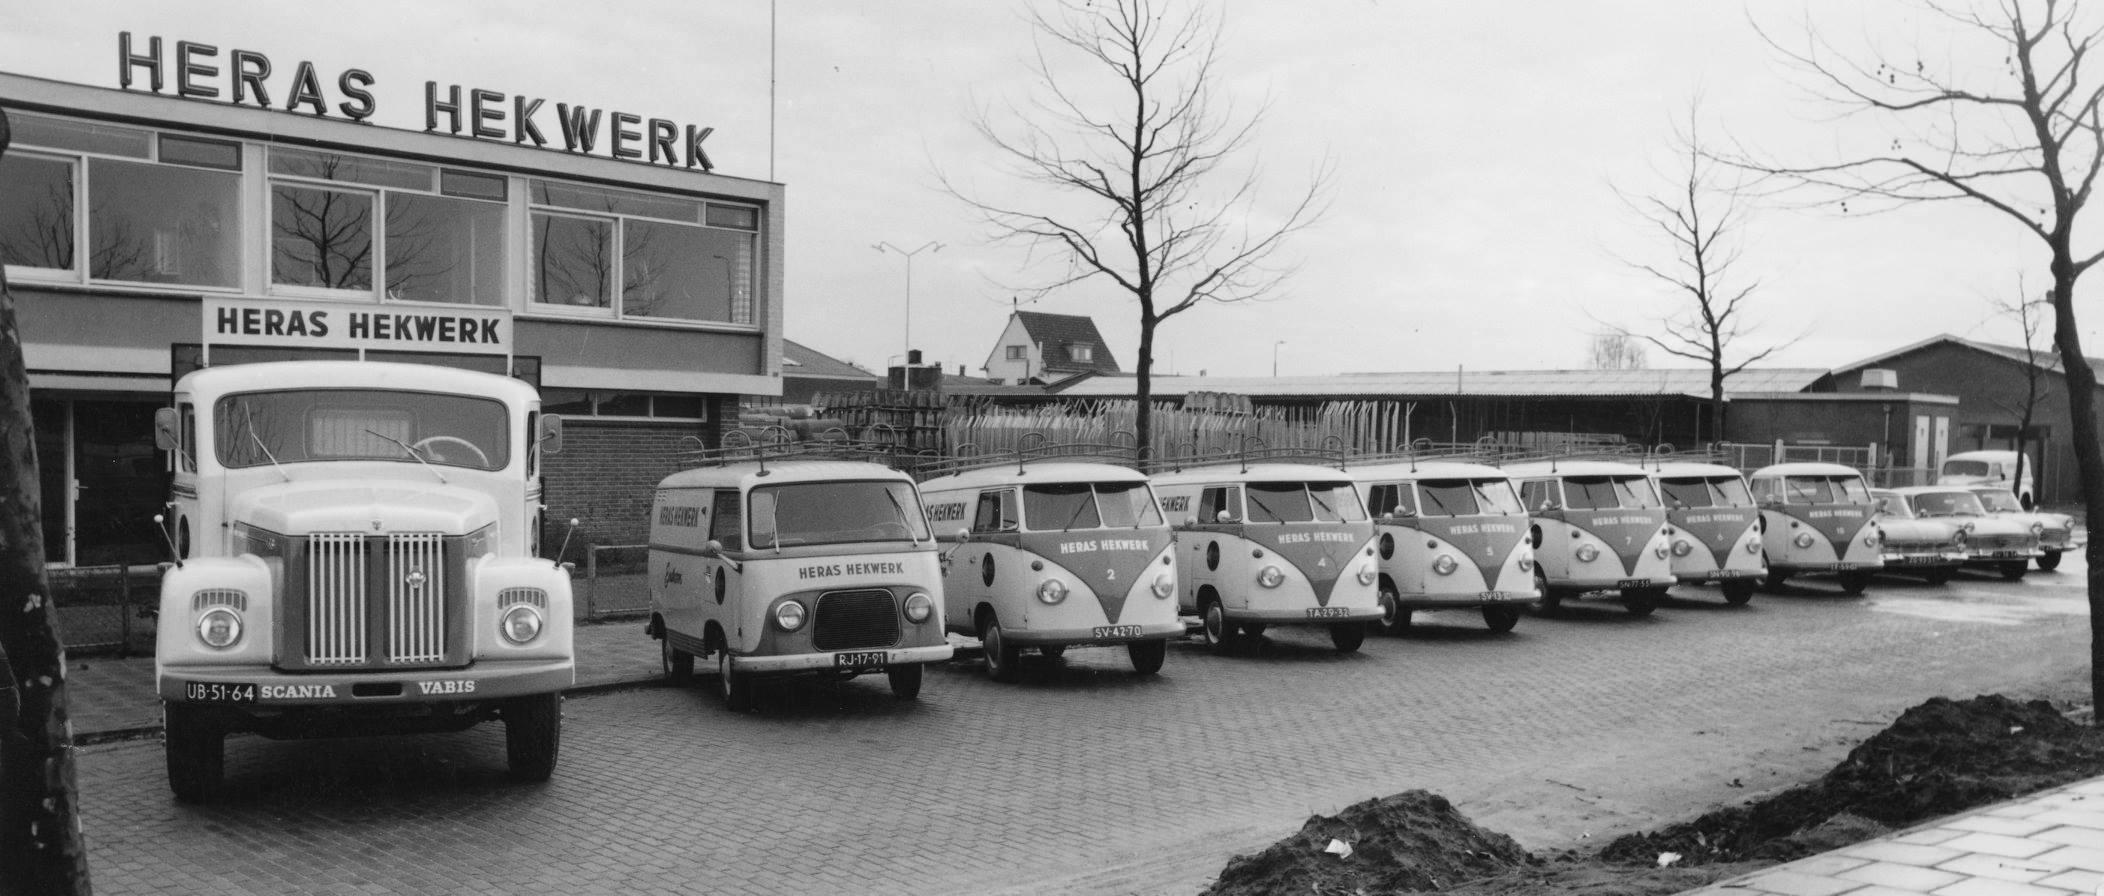 1961-Eindhoven-Jeroen-Boschlaan-Heras-Hekwerk